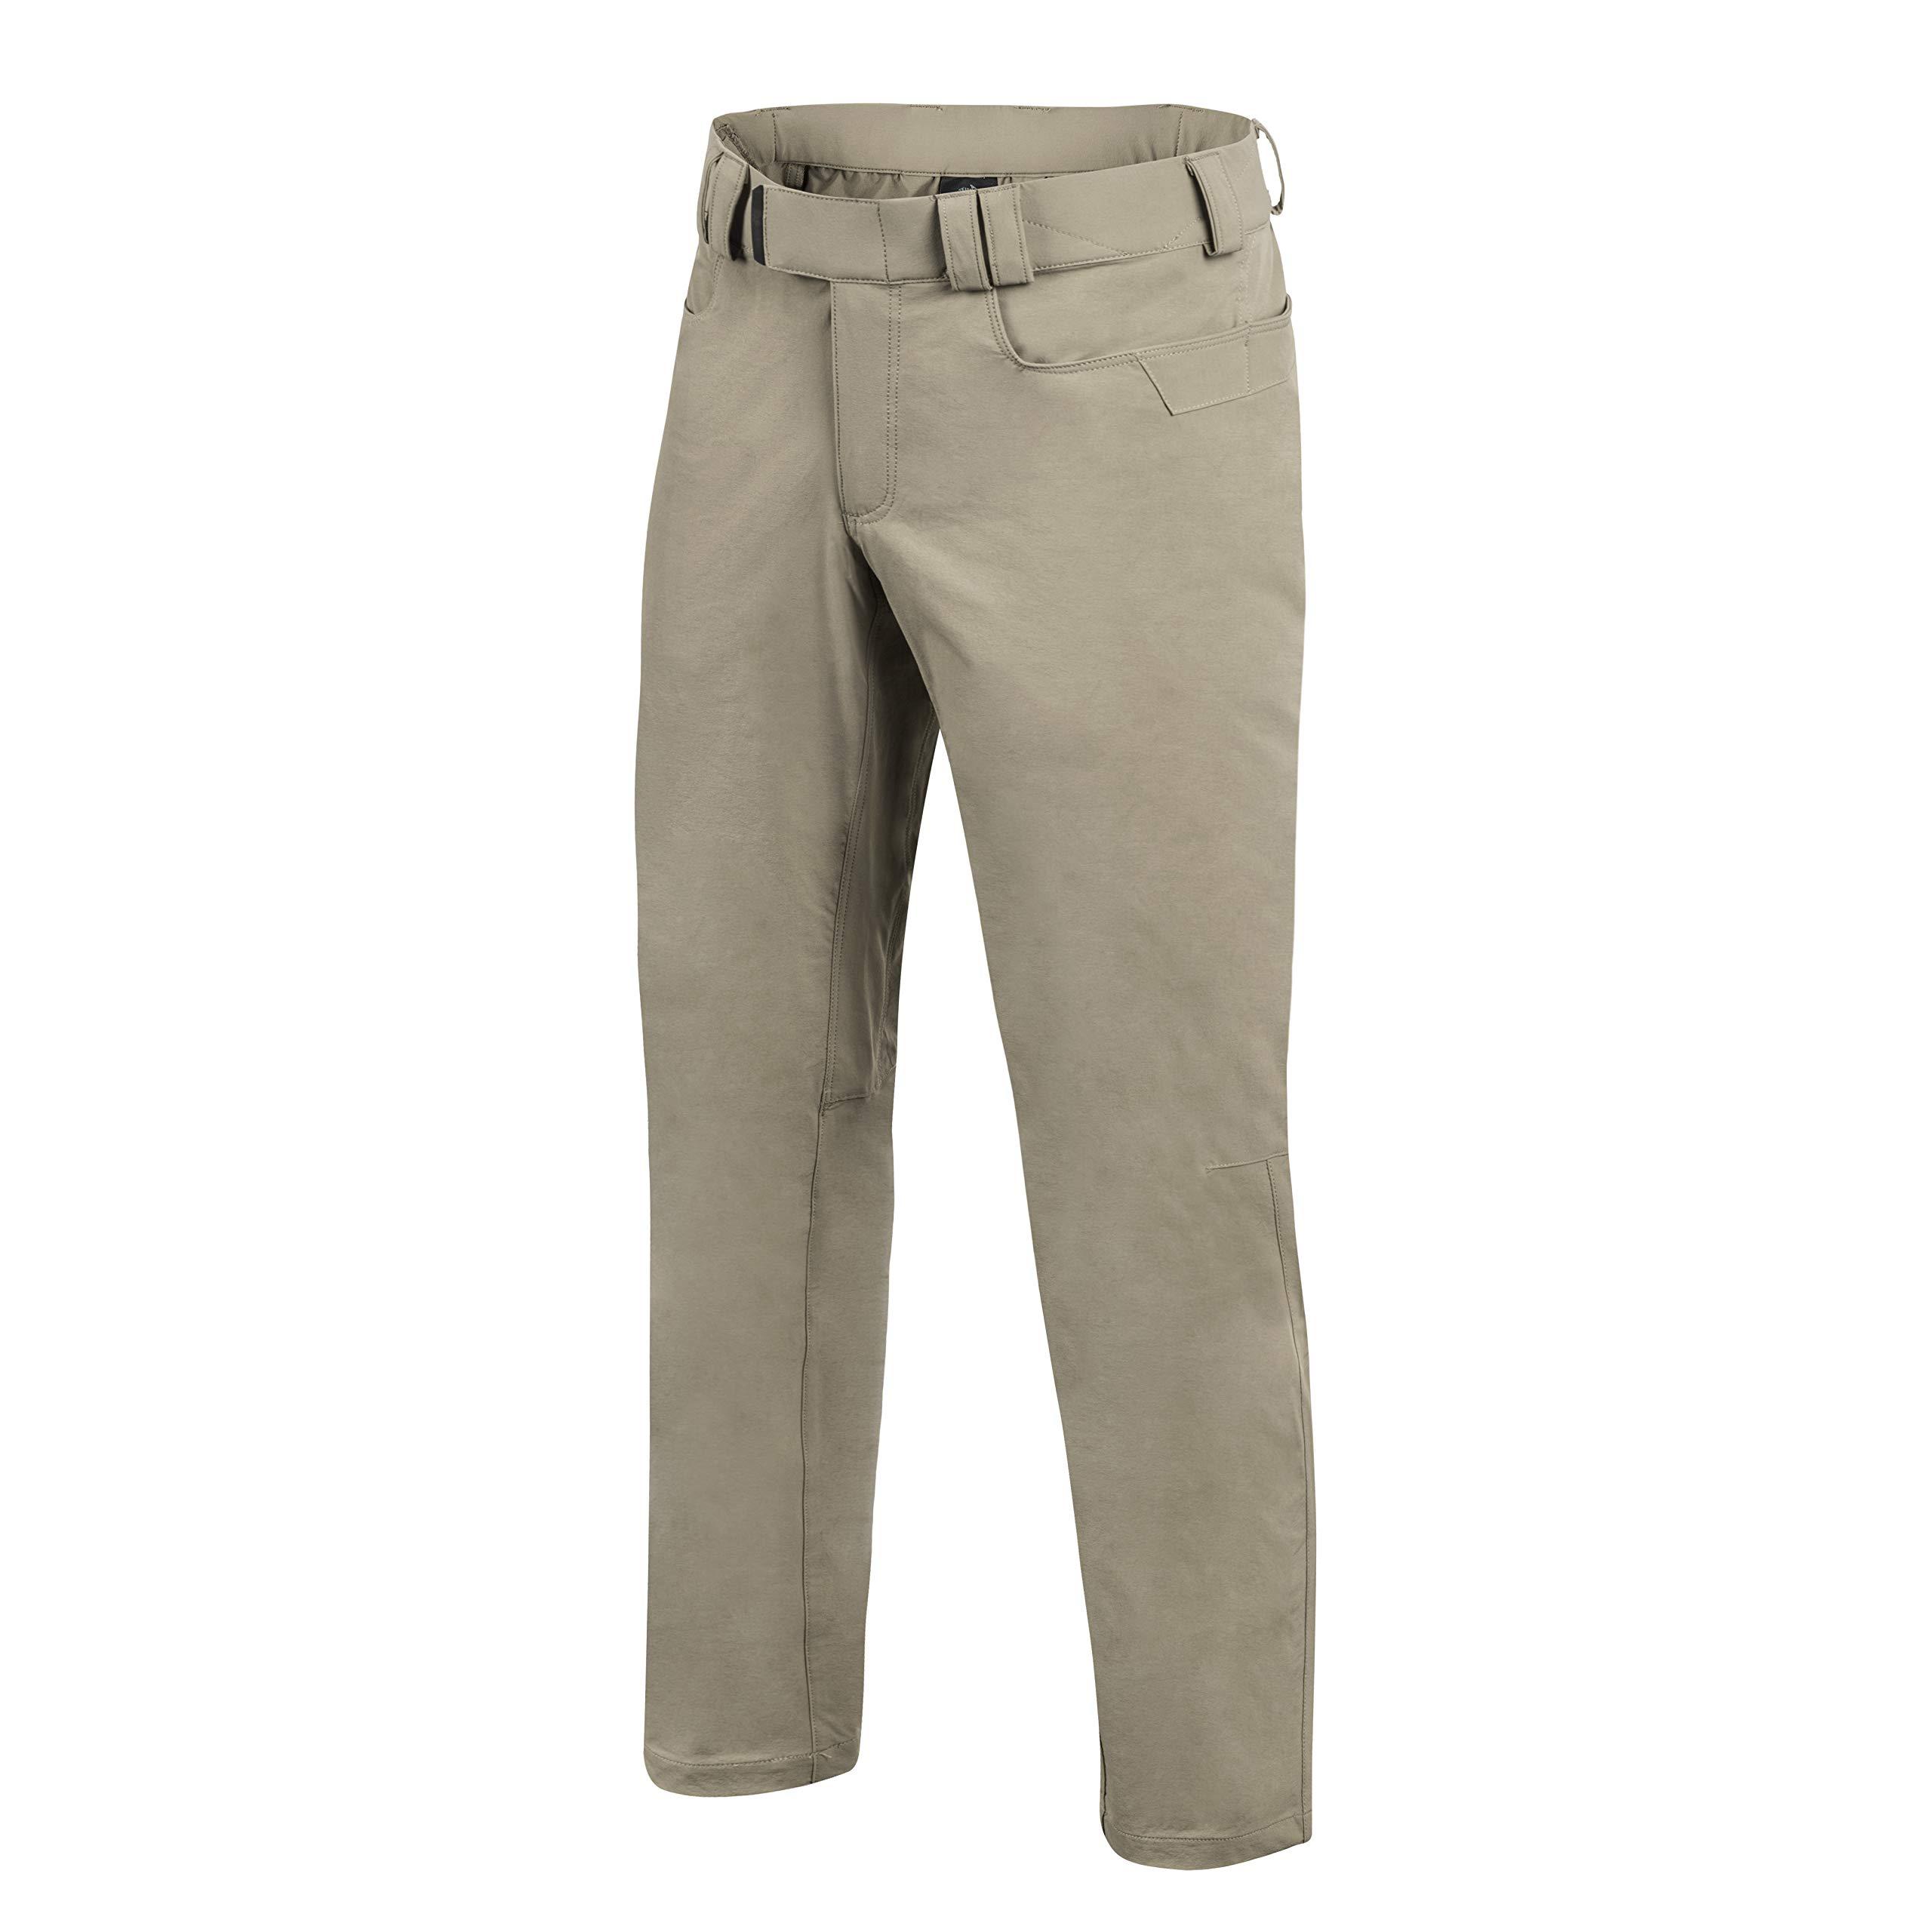 Helikon-Tex CTP Covert Tactical Pants, Khaki